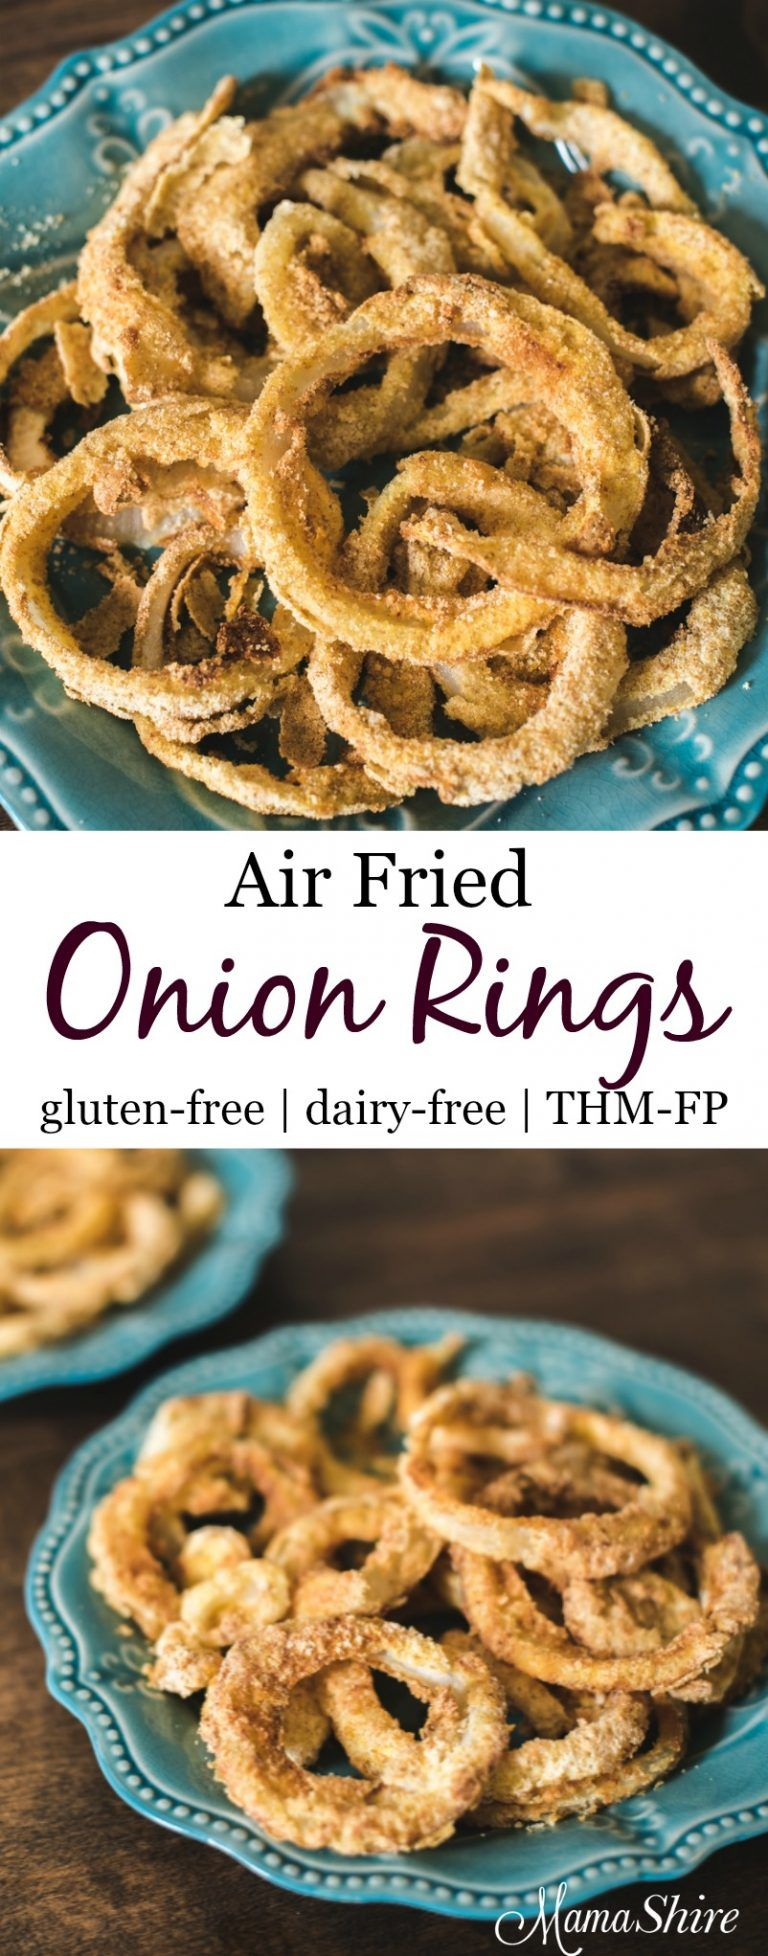 Air Fried Gluten Free Onion Rings Recipe Air fryer